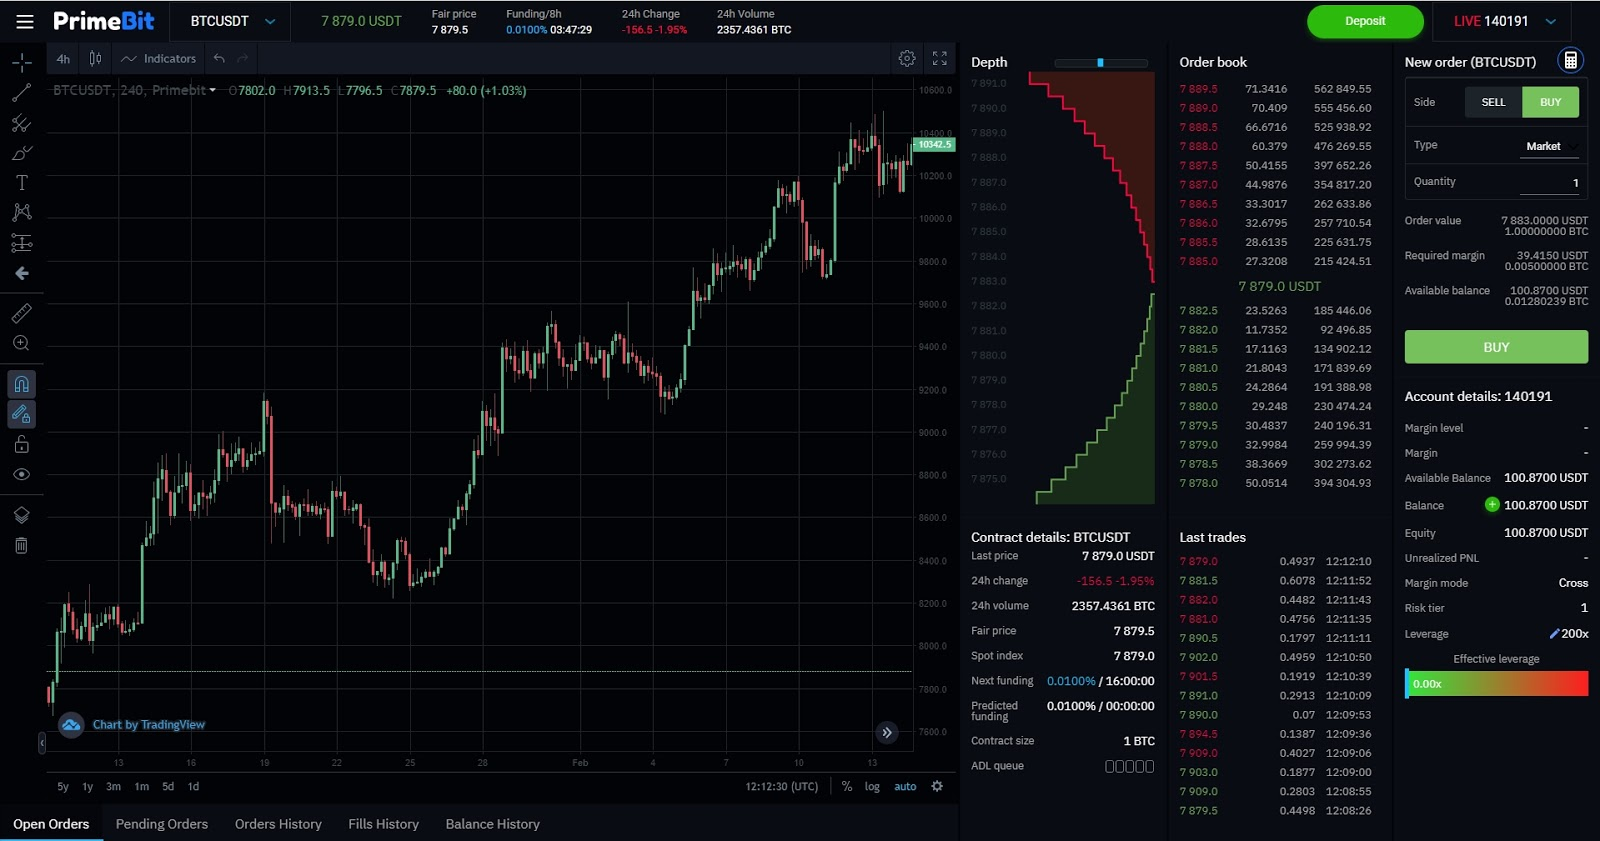 bitcoin kereskedési platform kaldet bitcoin kód)